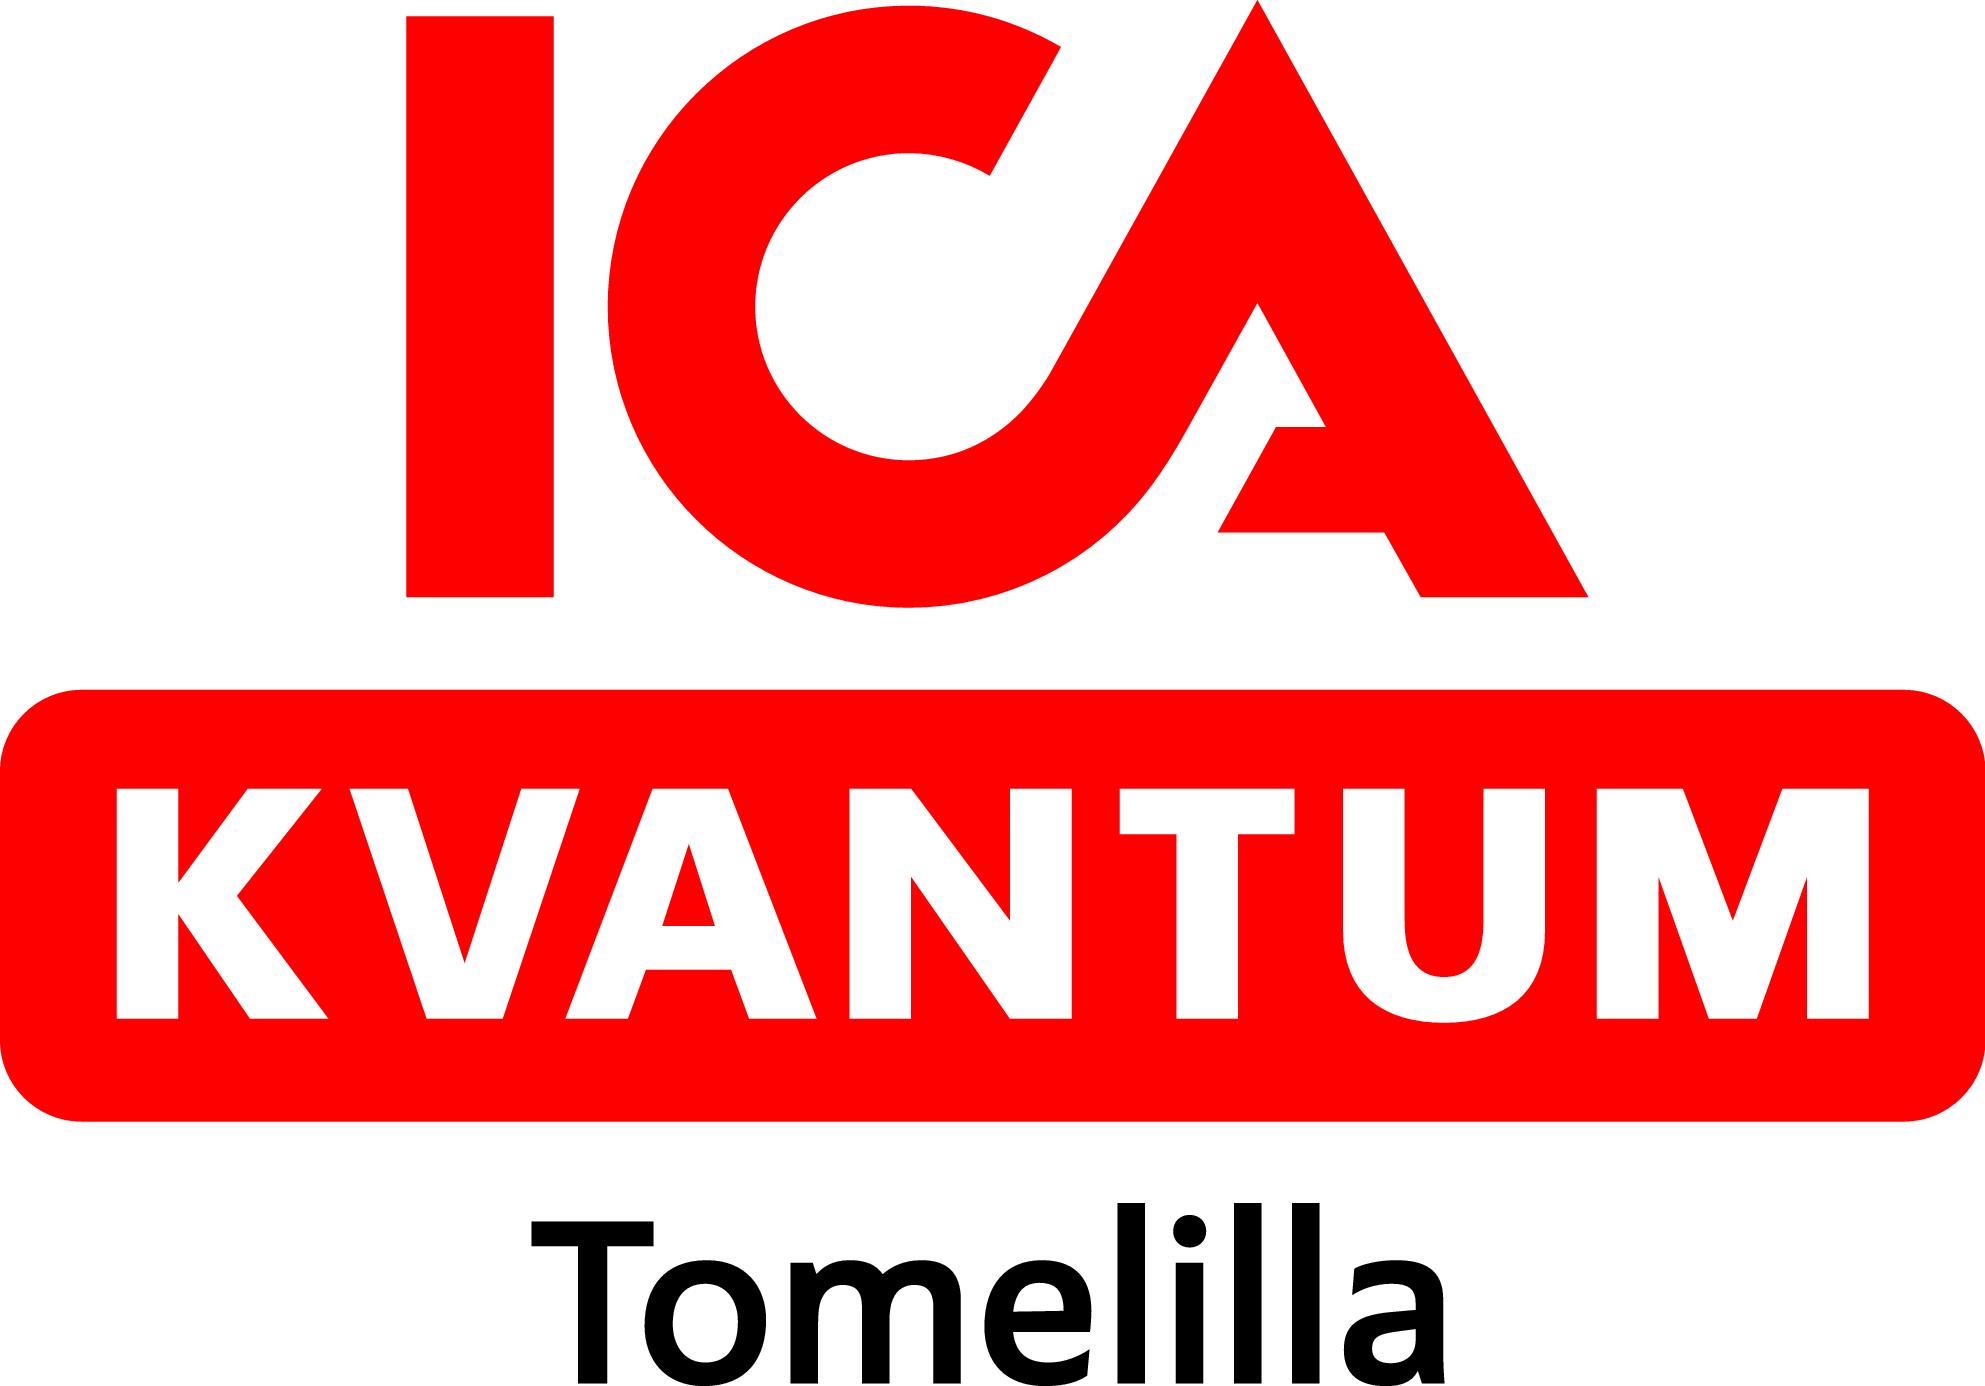 ICA Kvantum Tomelilla logotyp